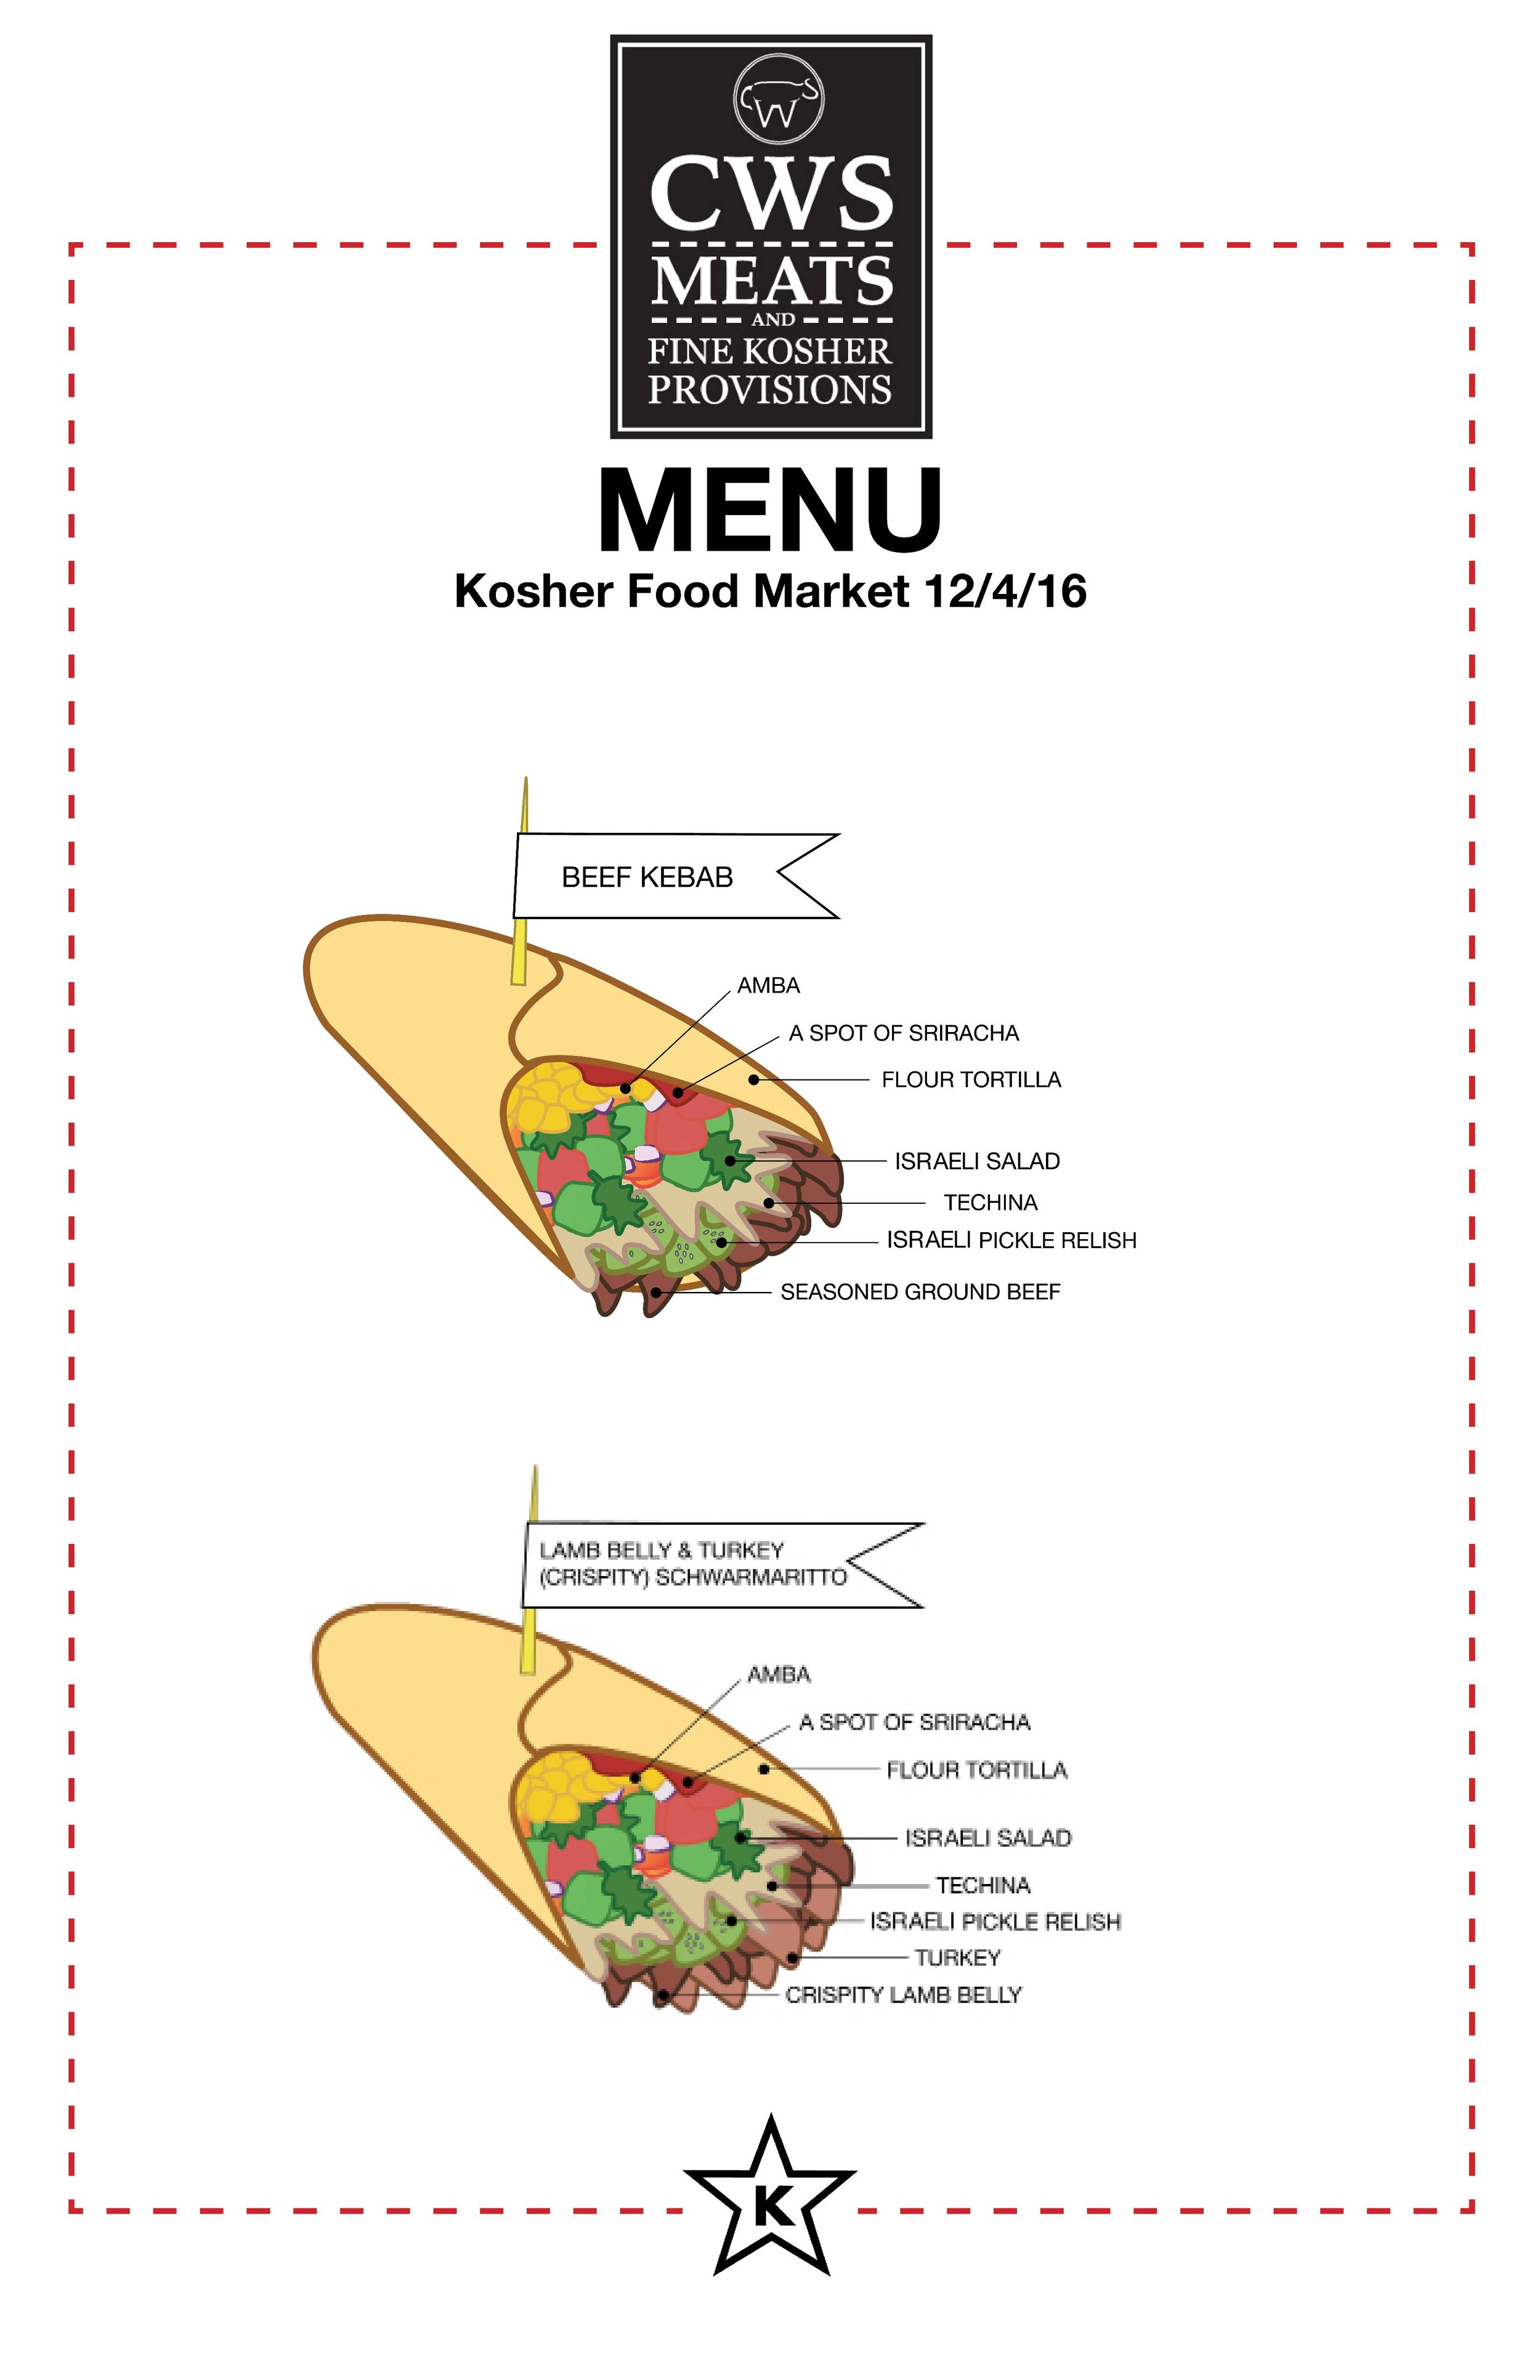 CWS menu 12/4/16